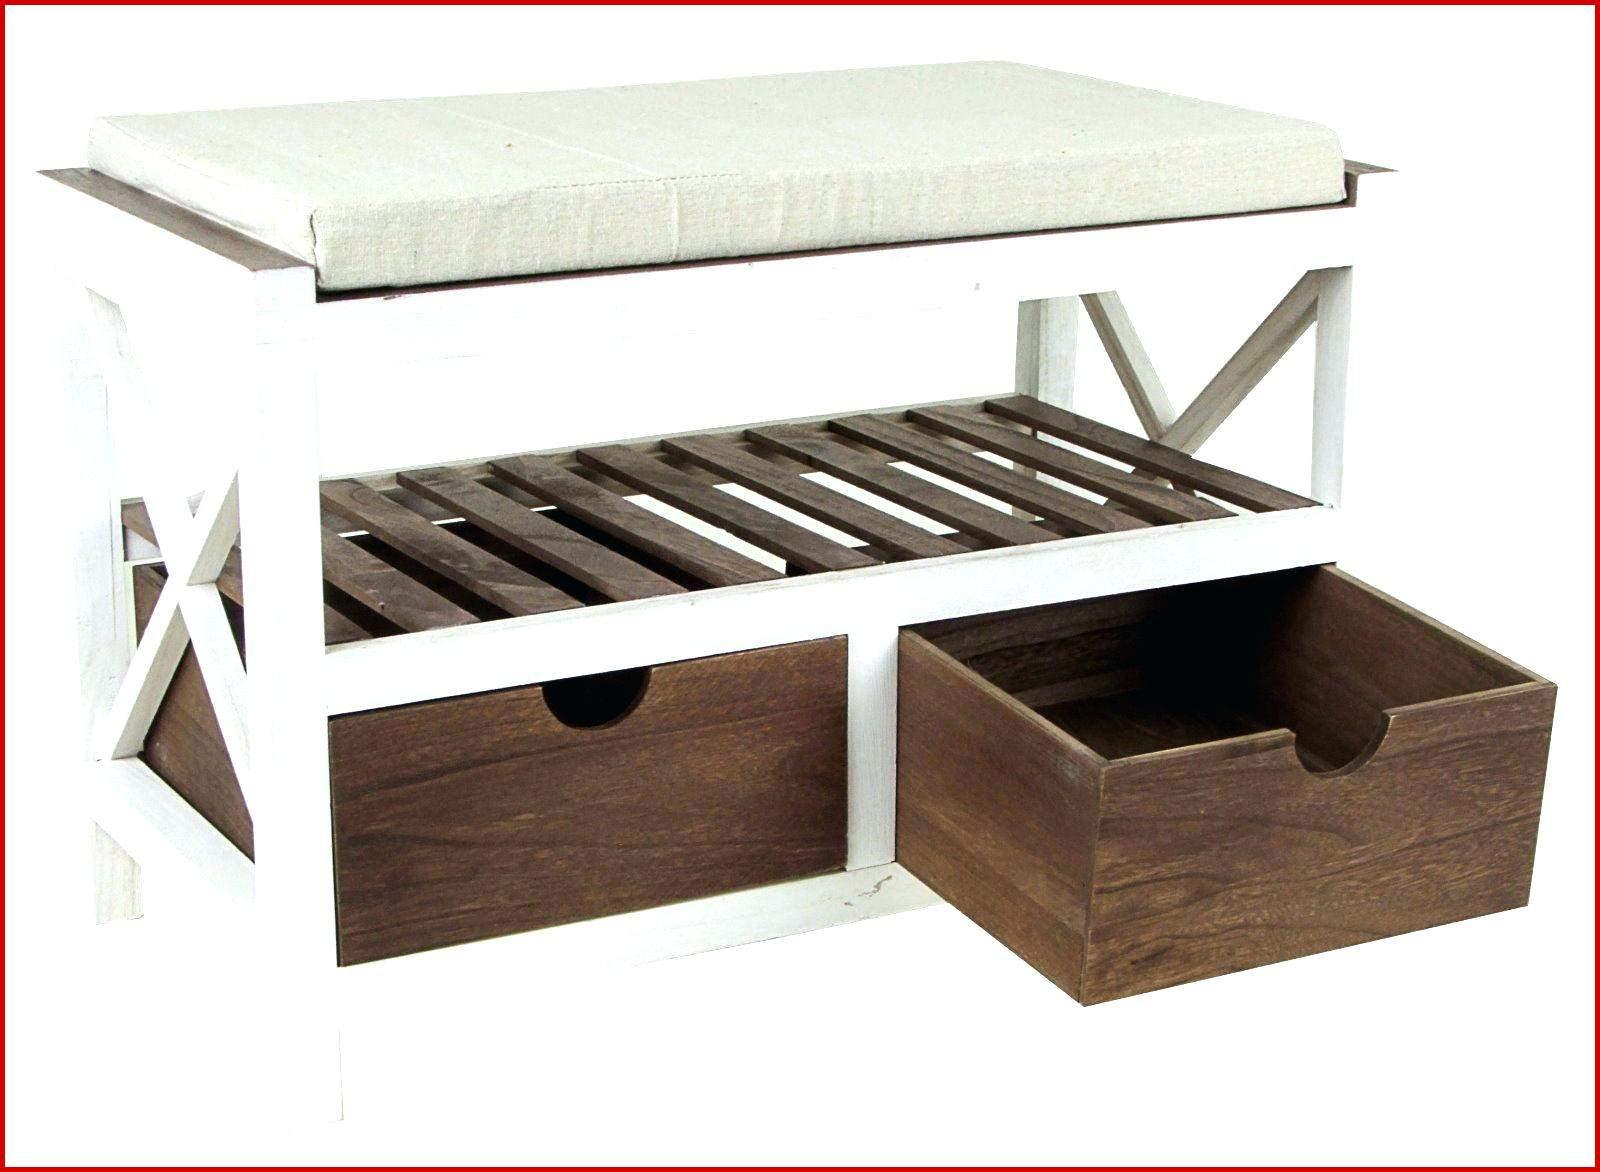 Ikea Bank Garten Inspirierend Esstisch Mit Bank Ikea Garten Anlegen